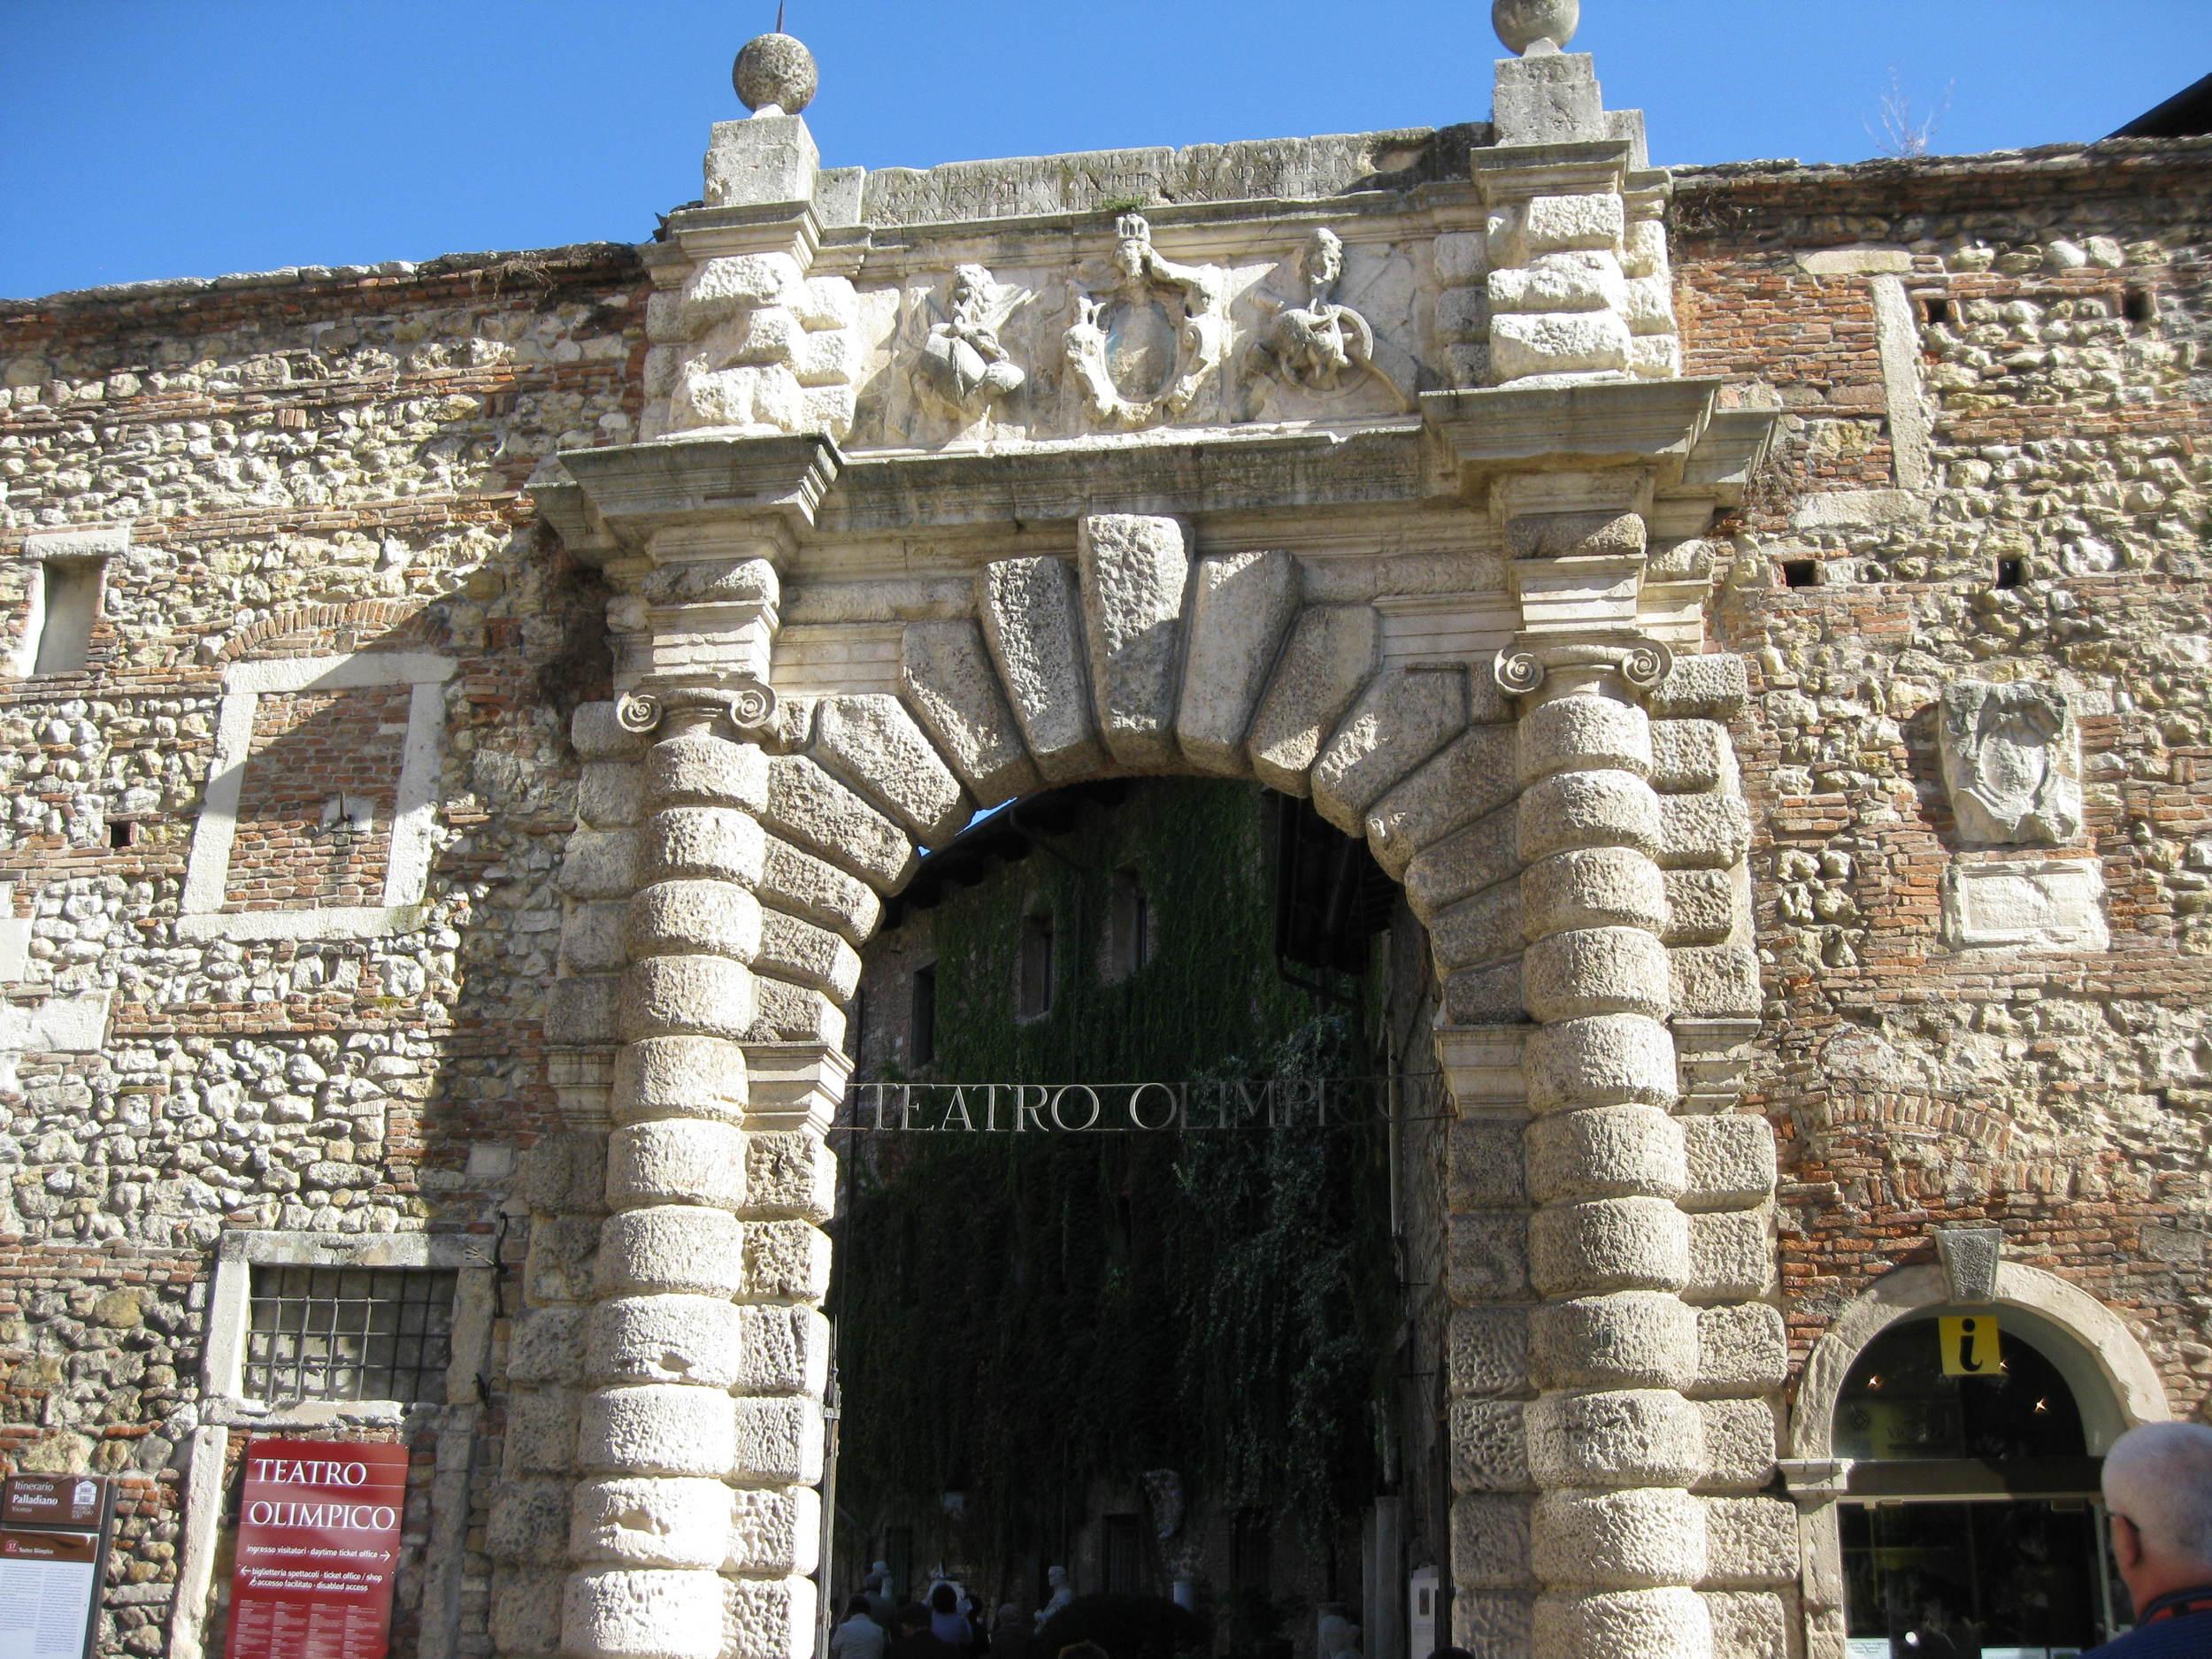 CRO Italy web 2011 - 10.JPG